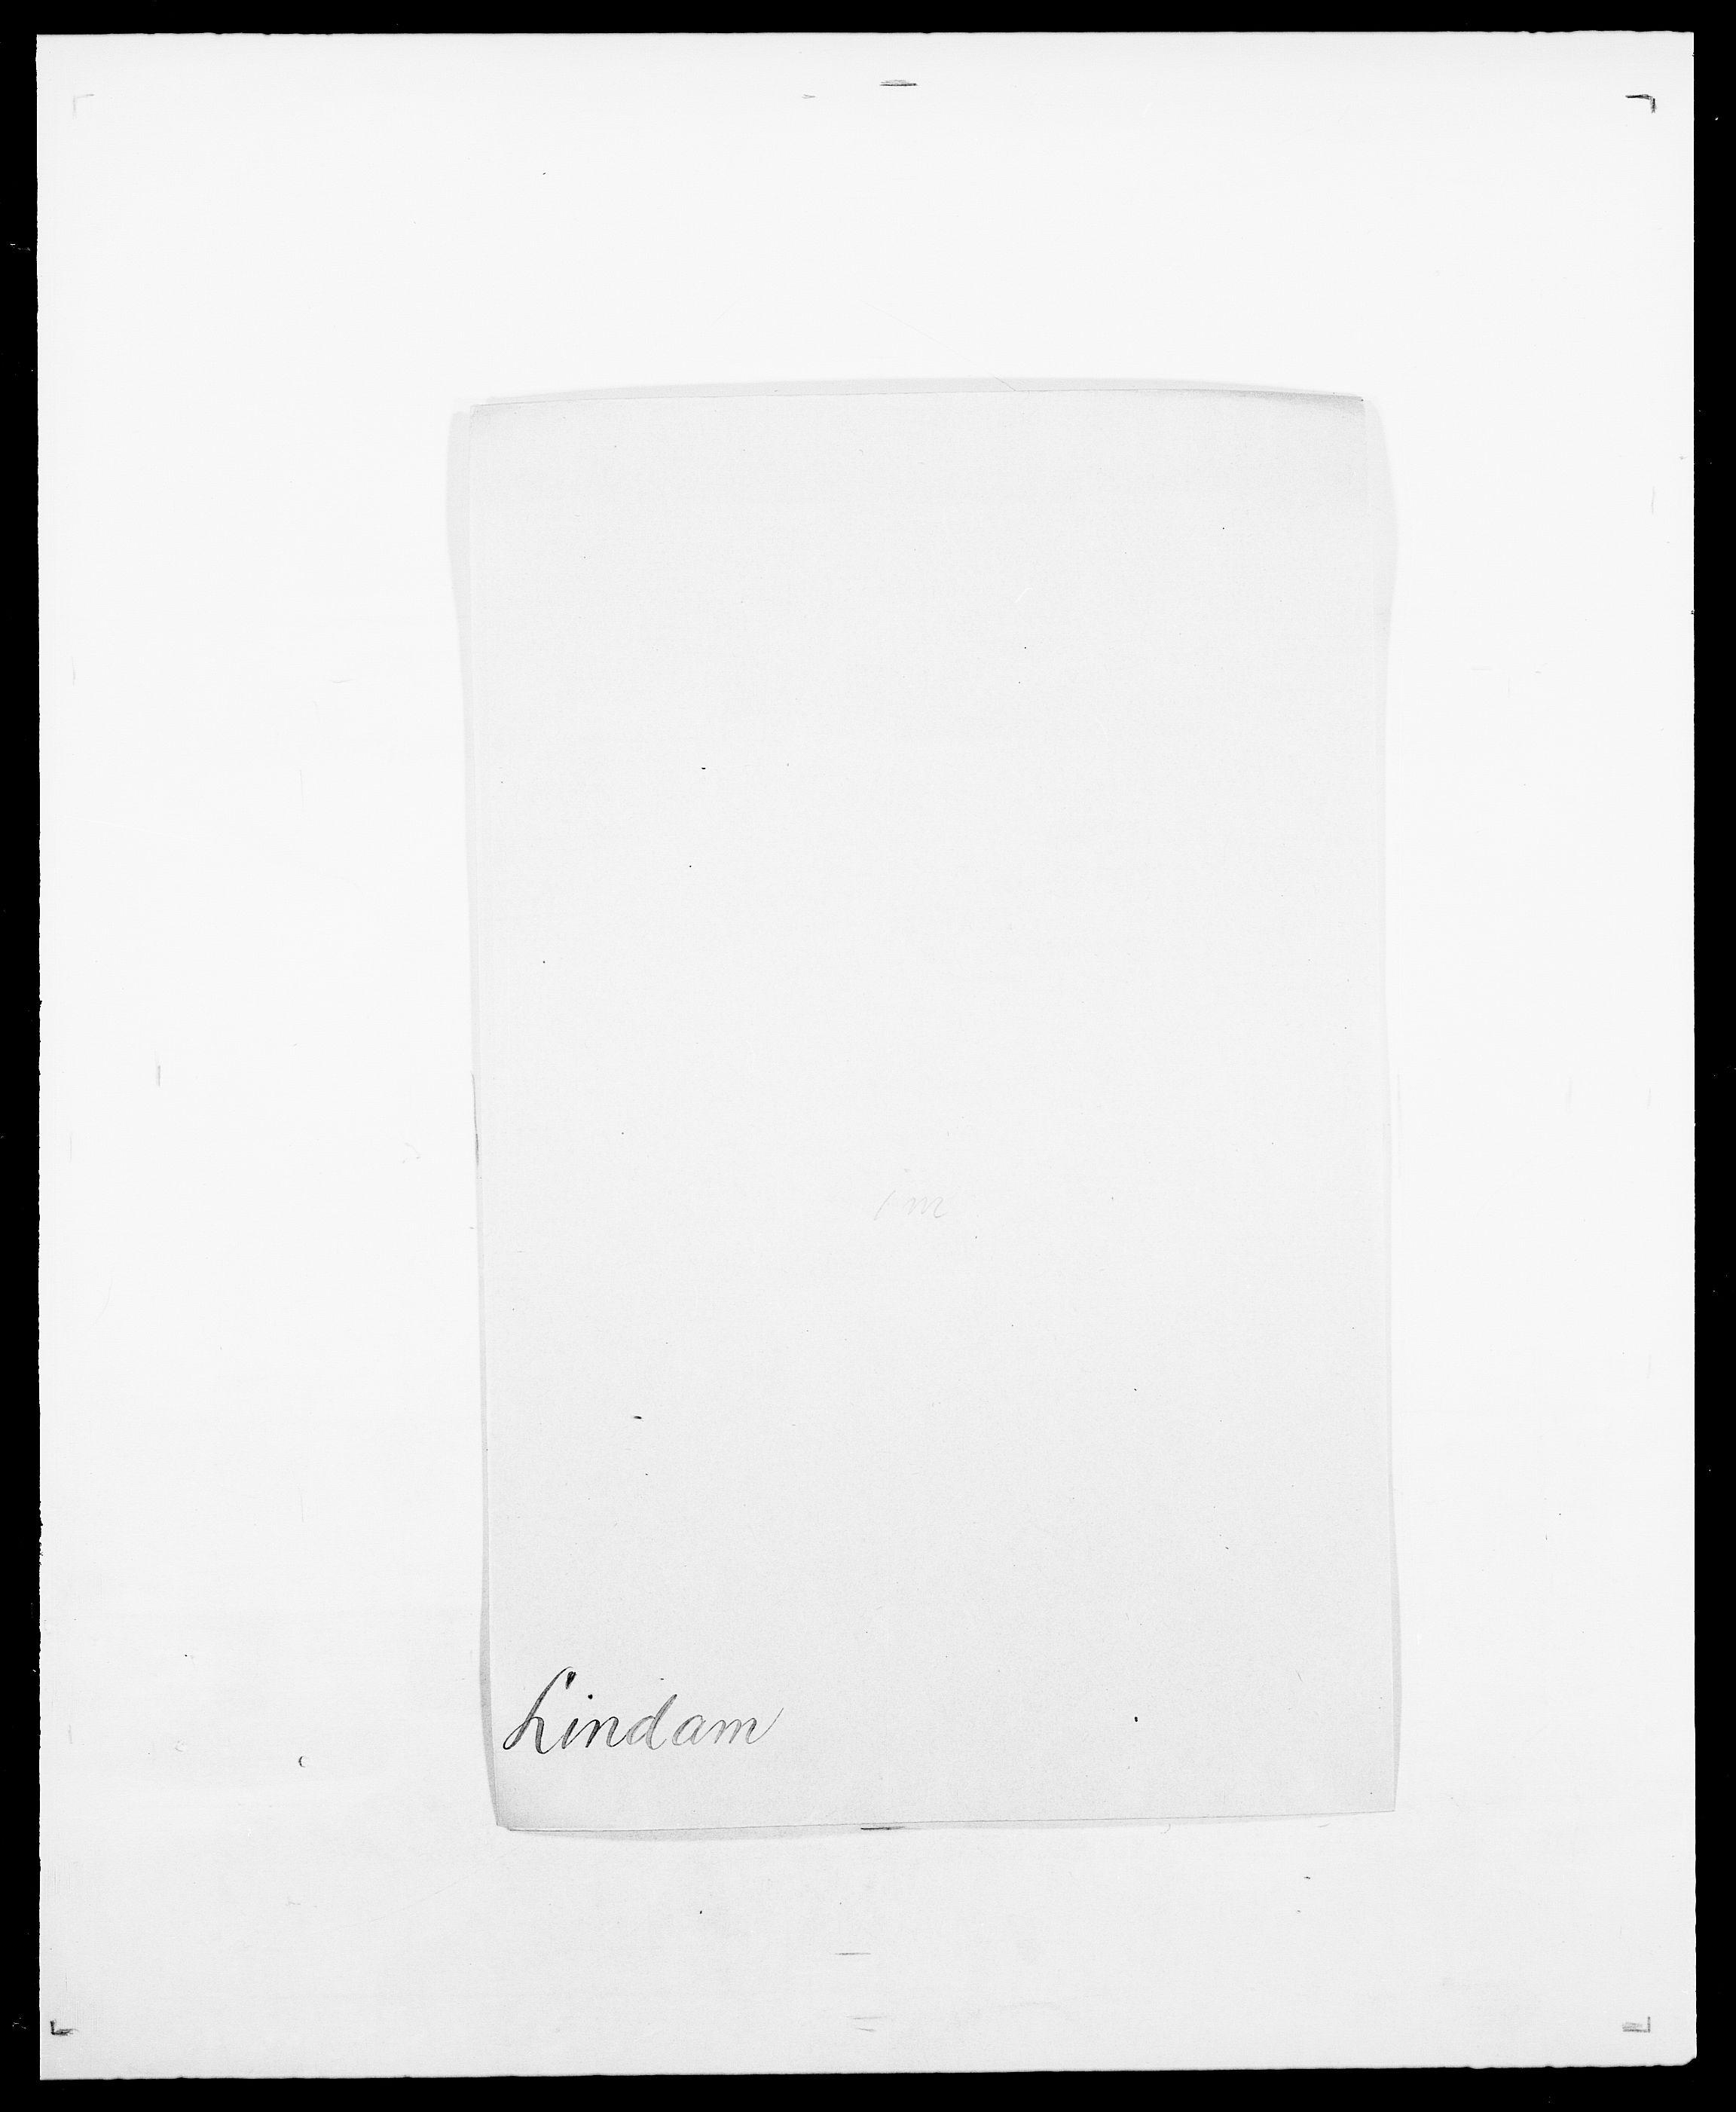 SAO, Delgobe, Charles Antoine - samling, D/Da/L0023: Lau - Lirvyn, s. 558